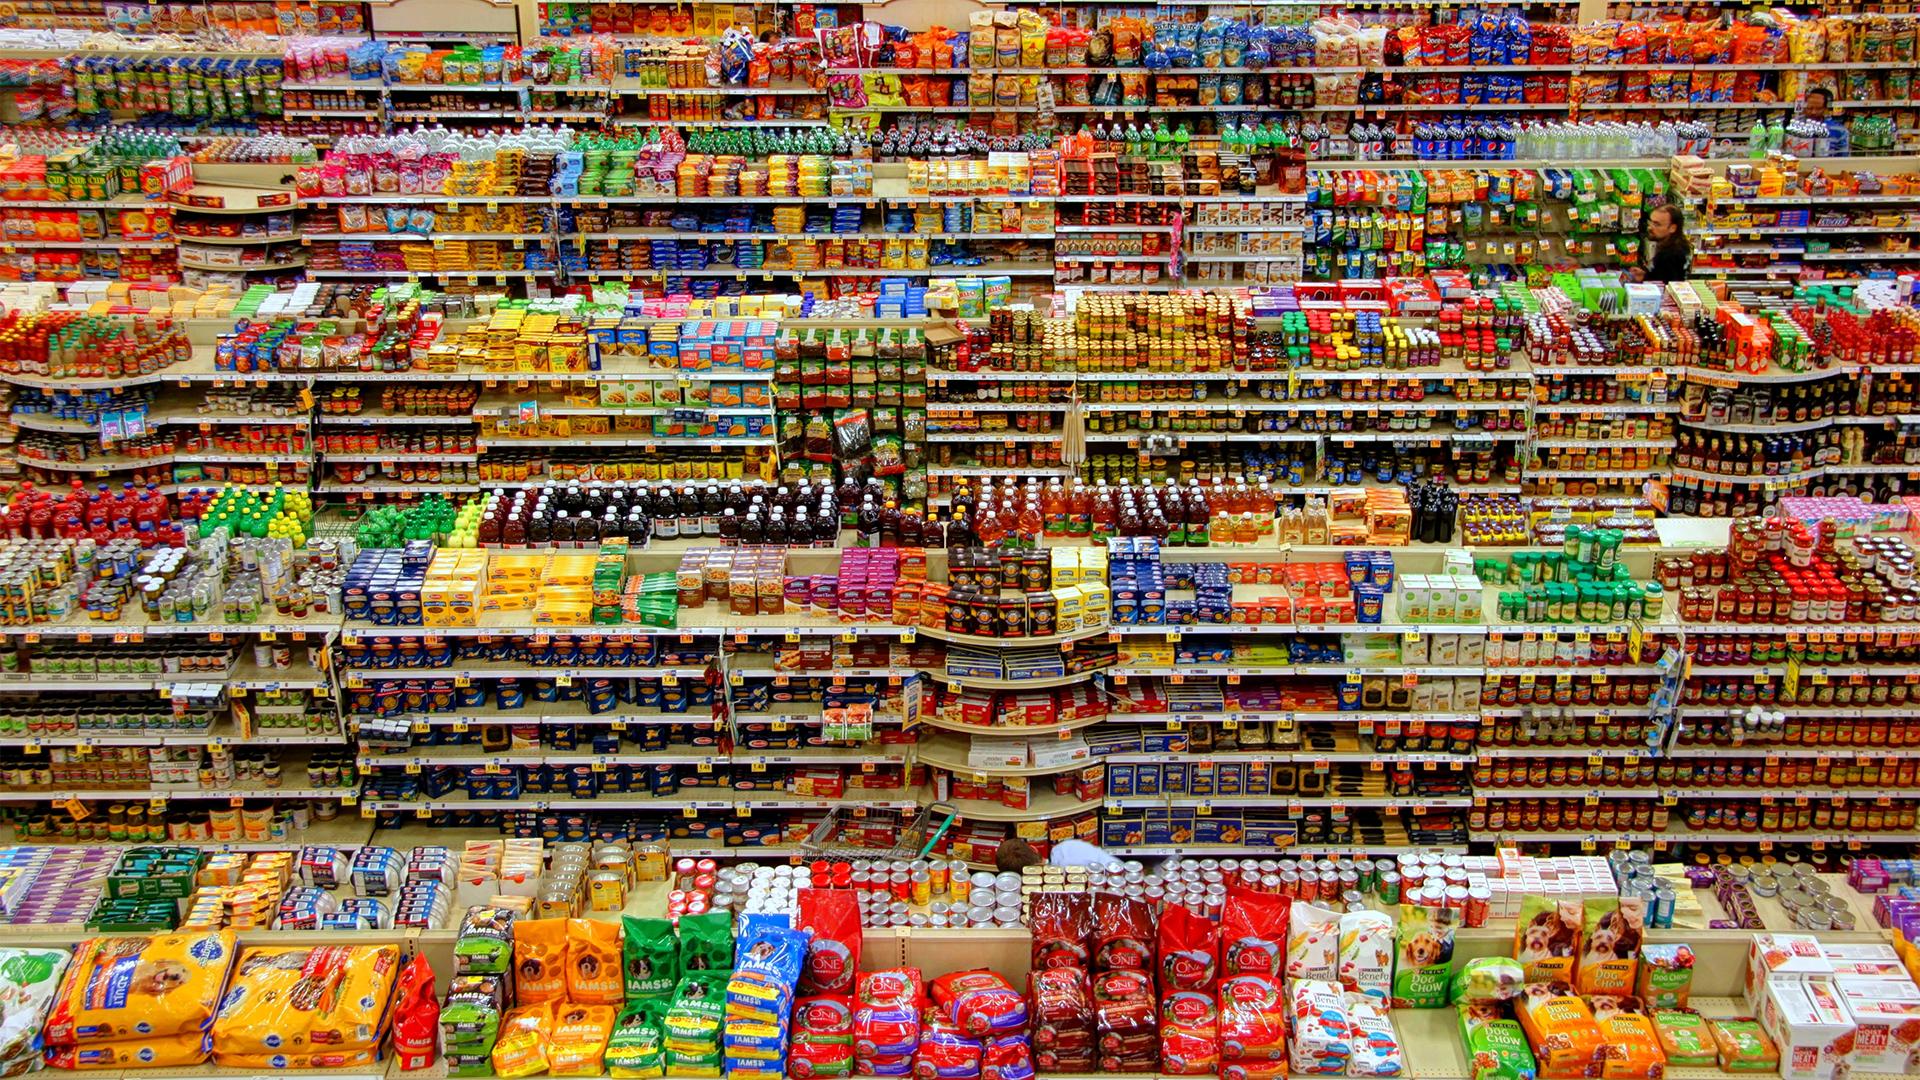 The Sensitives shopping isles hero